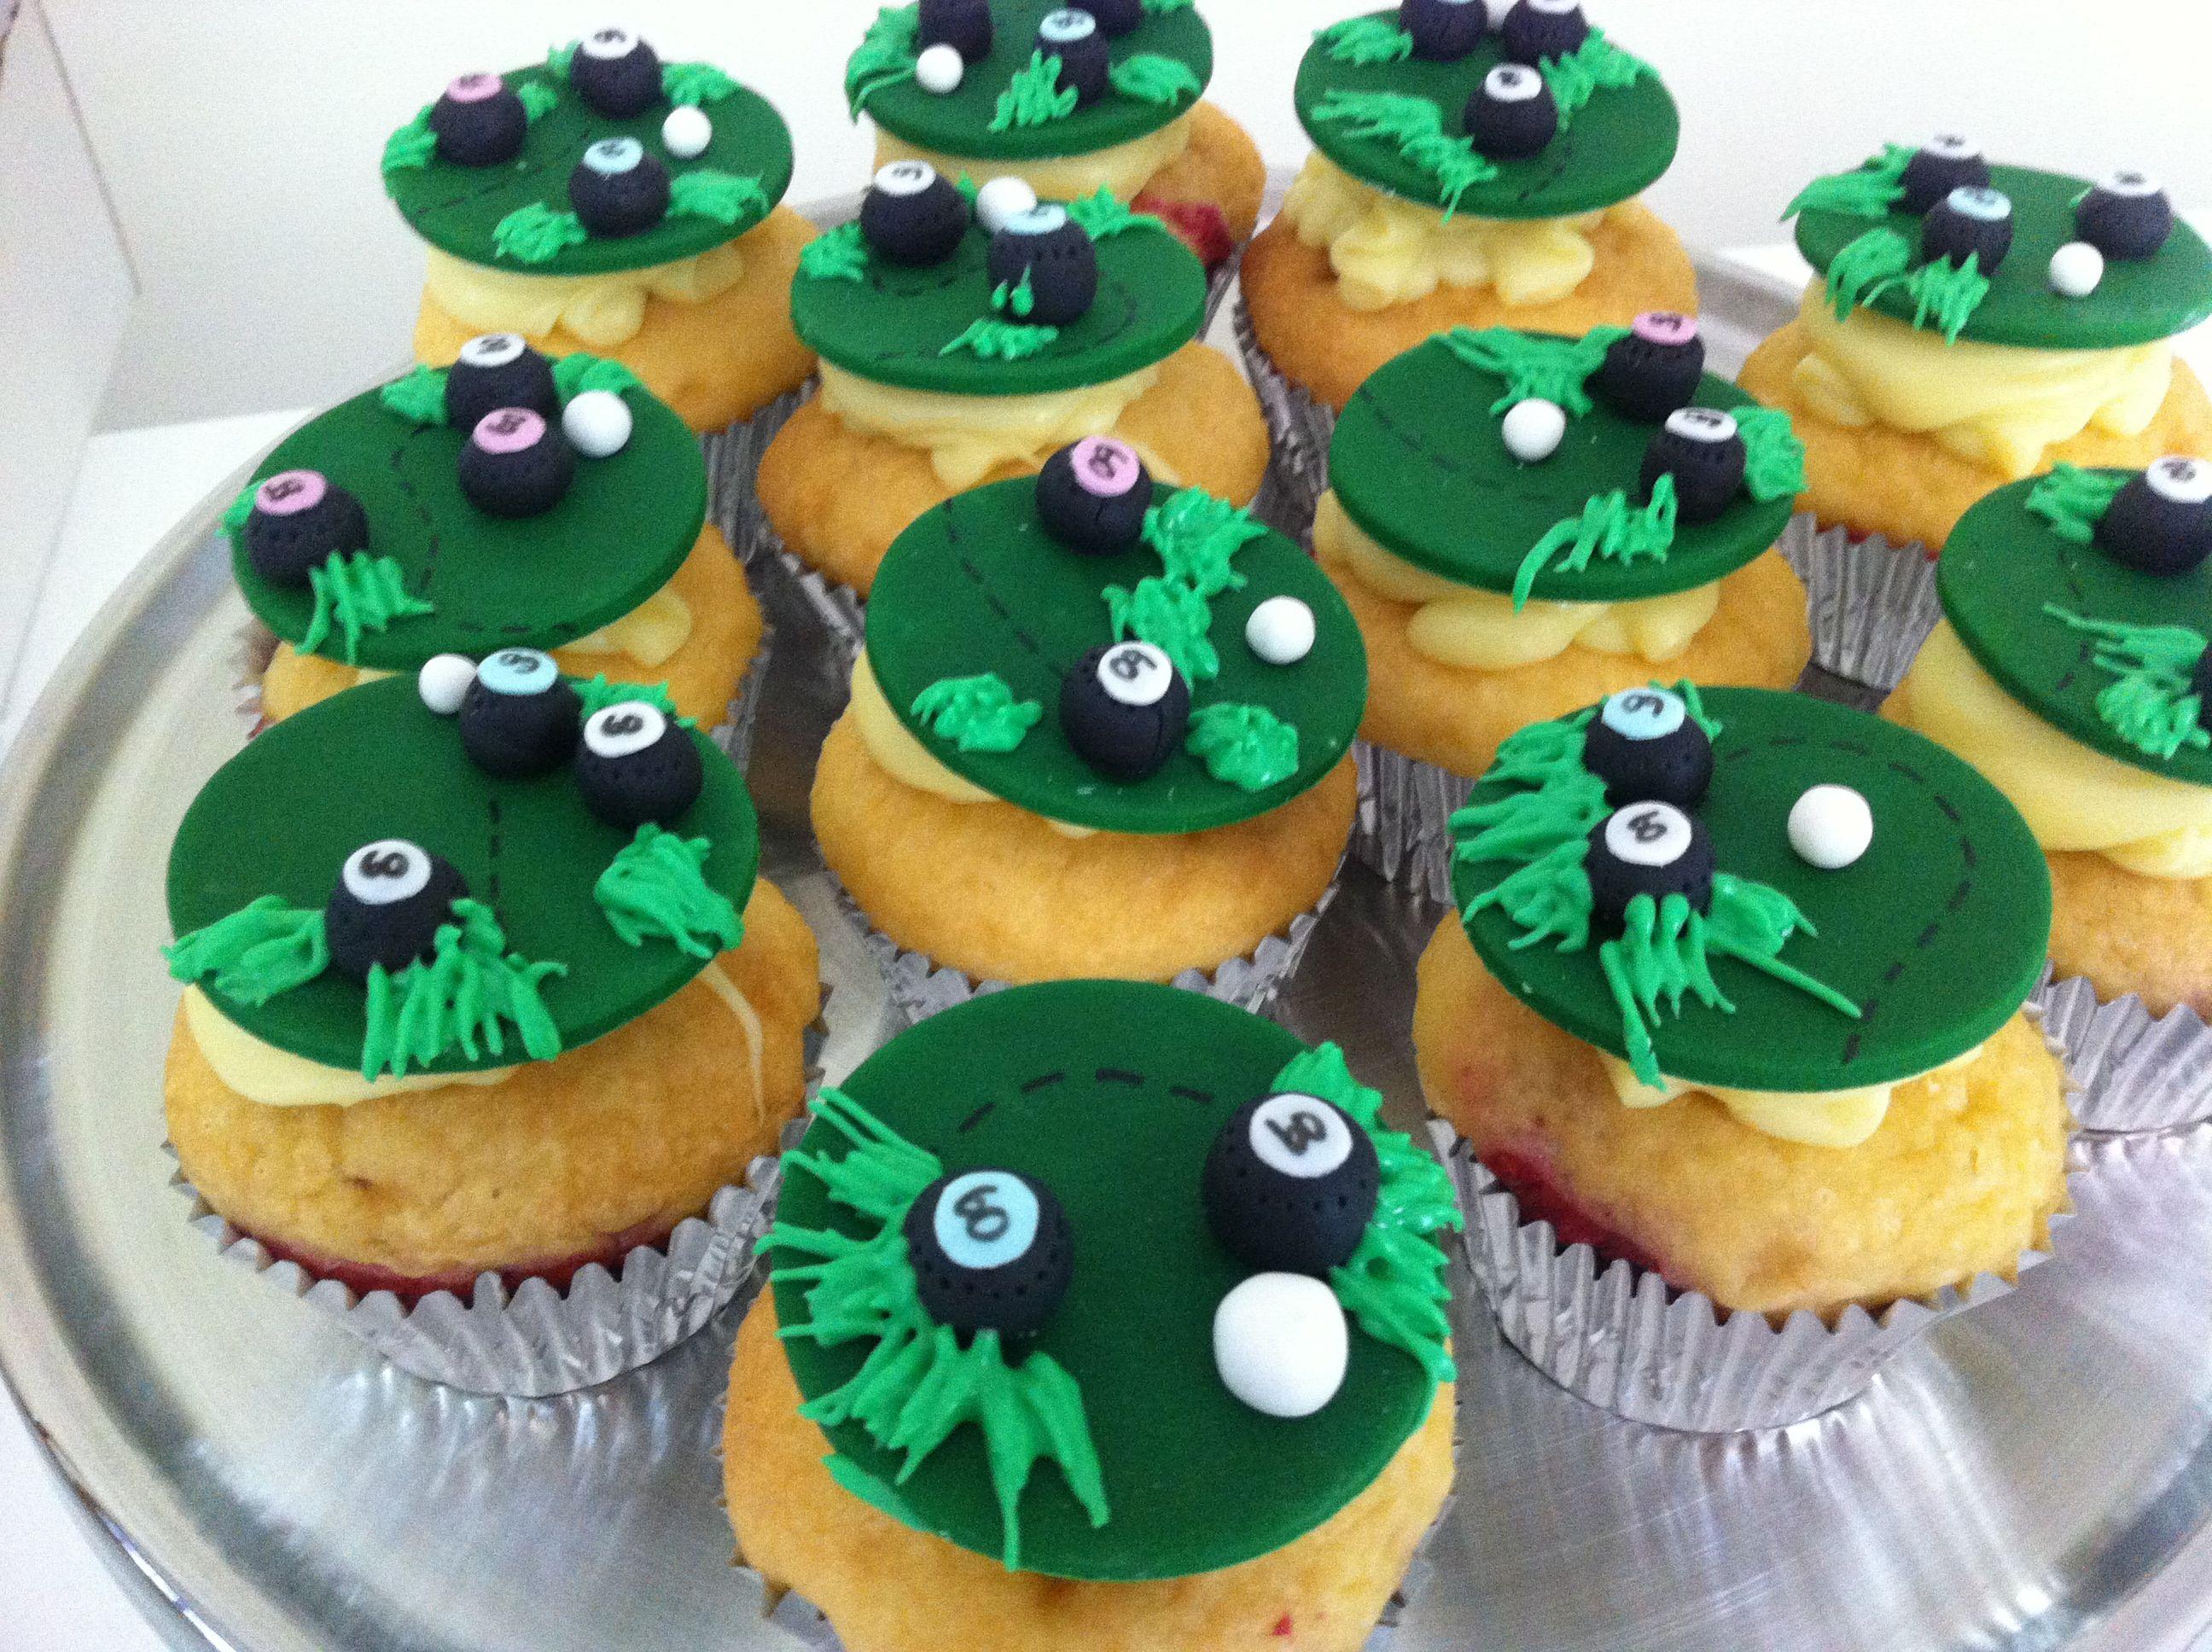 lawn bowls cupcakes u2022 by baking gorgeous www bakinggorgeous com